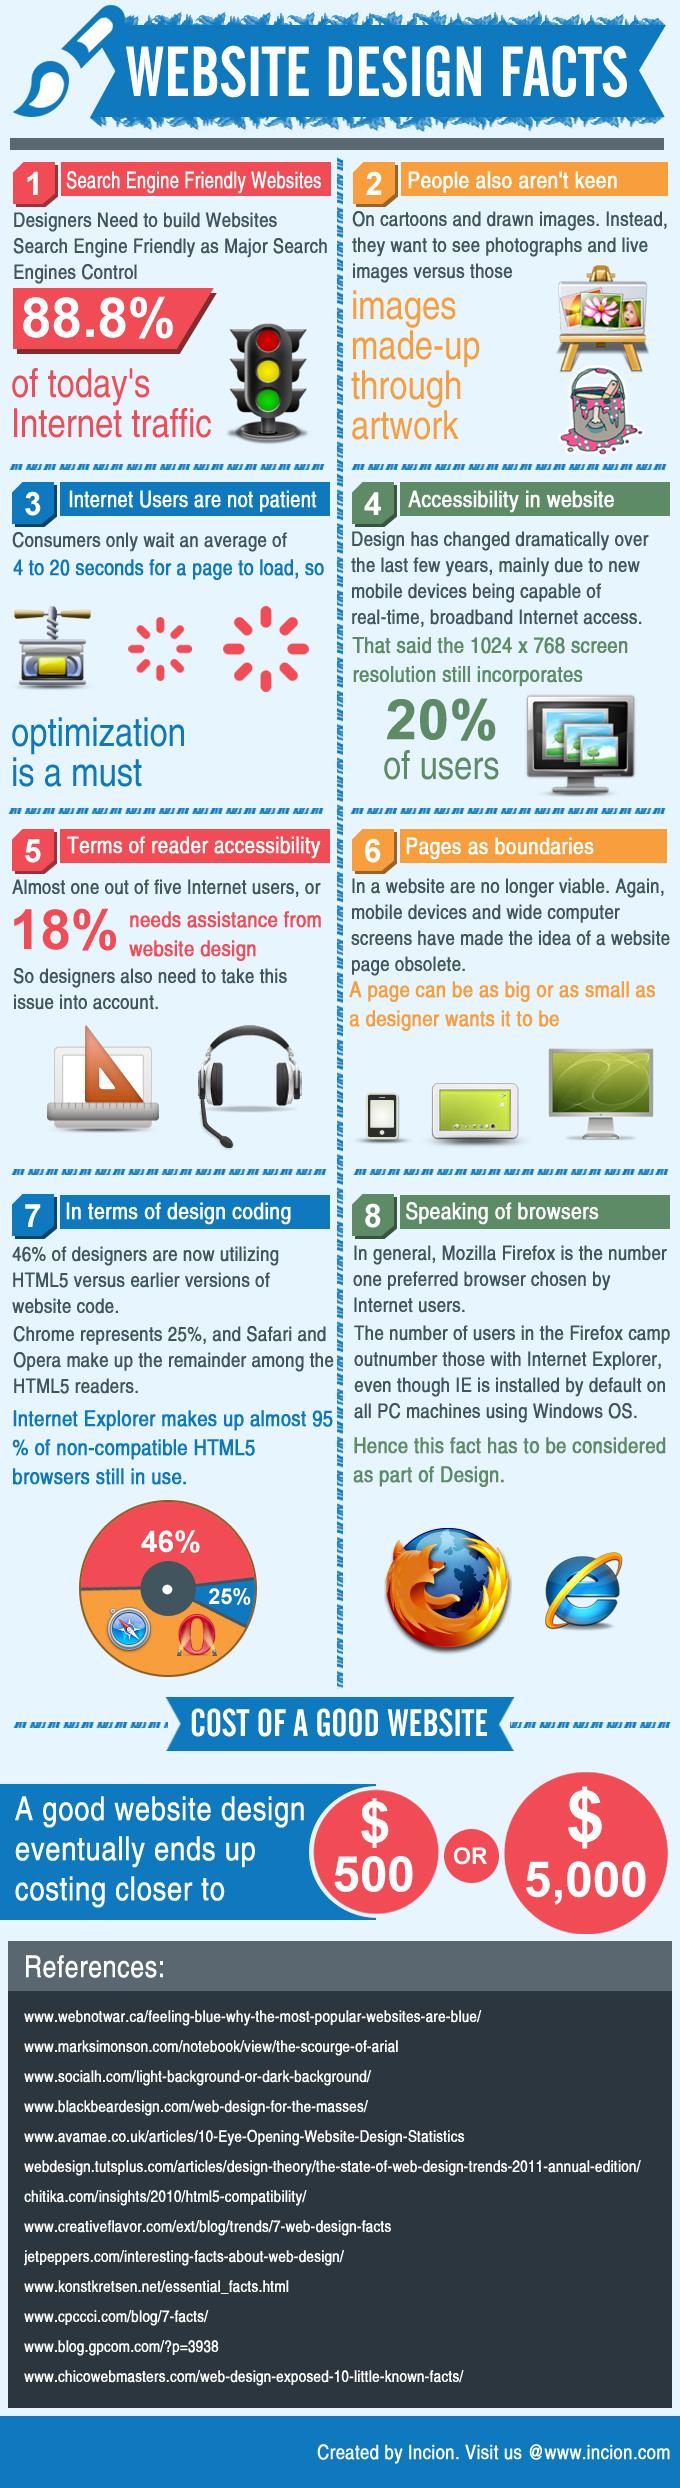 Website design facts